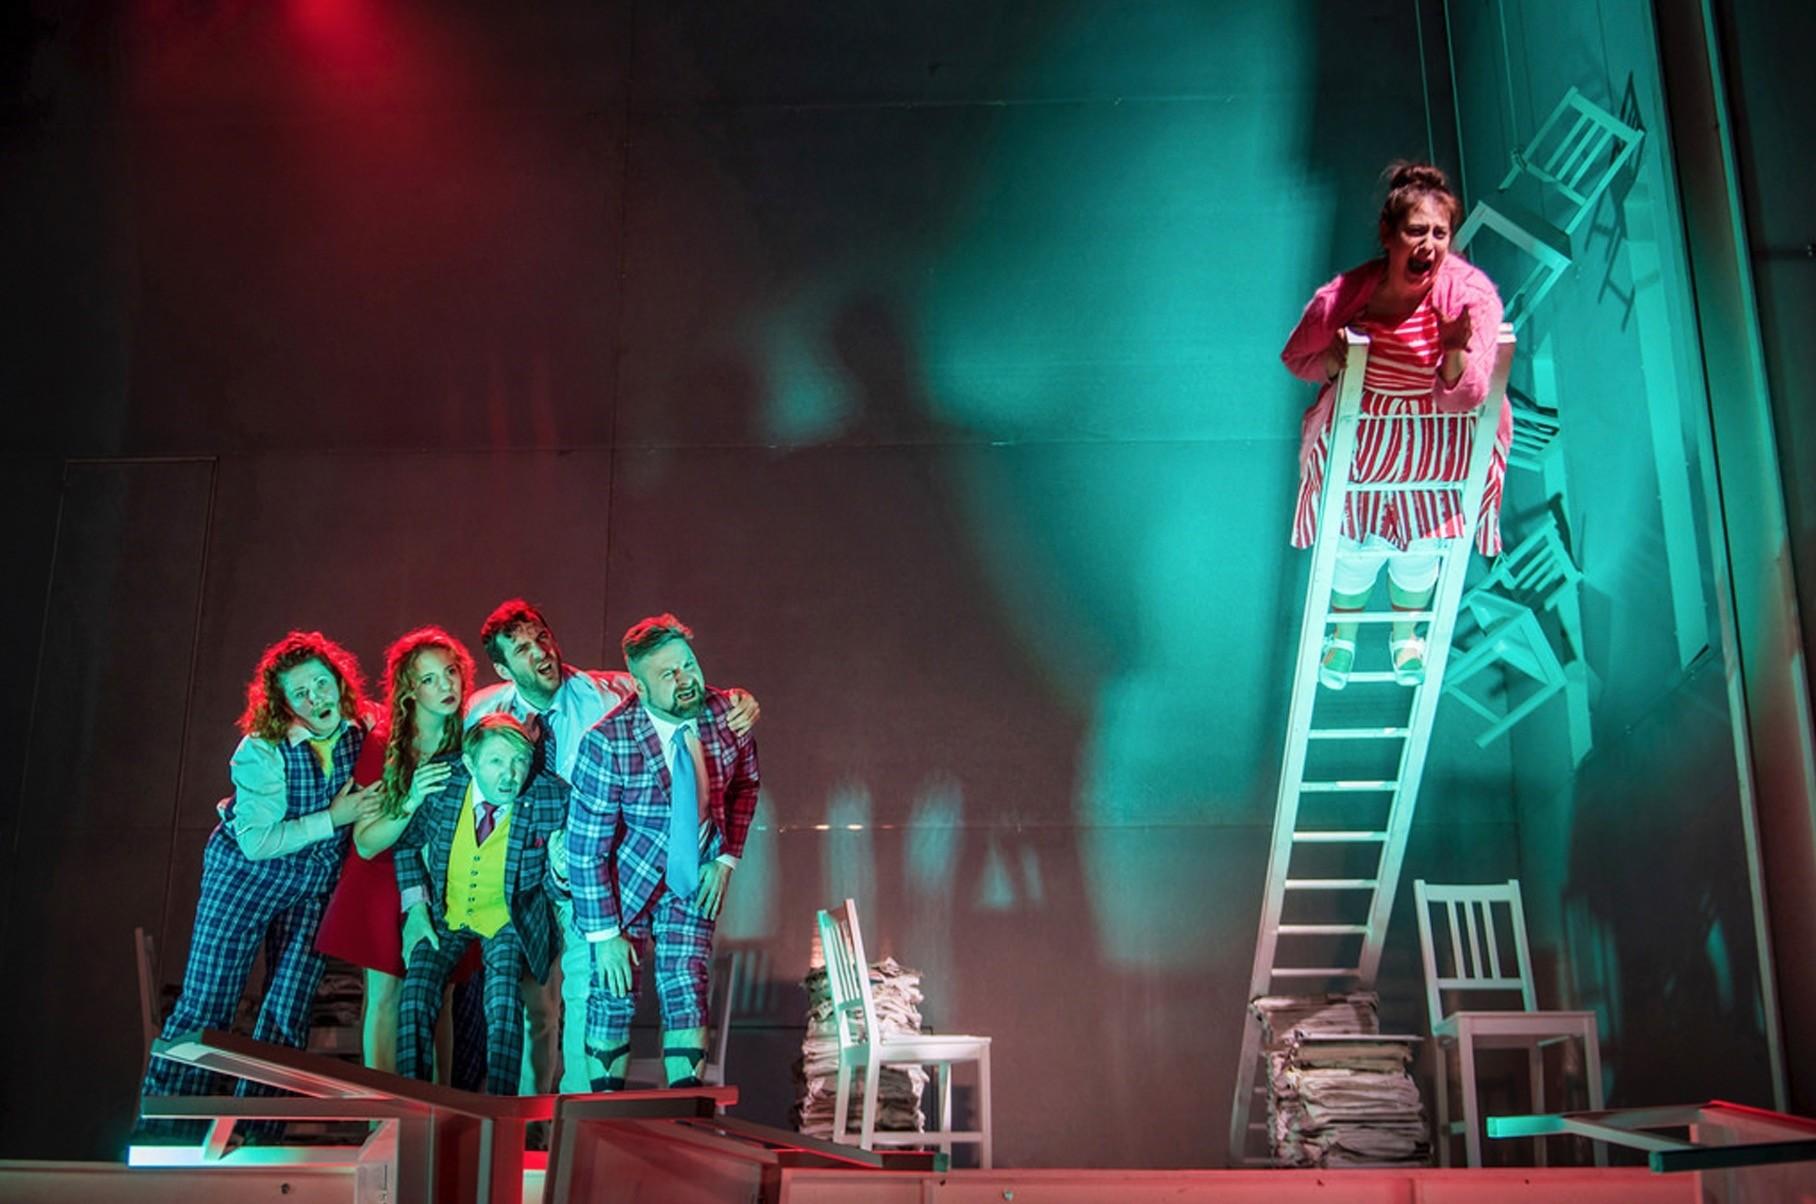 Scene from the theater play u201cRhinoceros,u201d photographed by Mihaela Bodlovic.